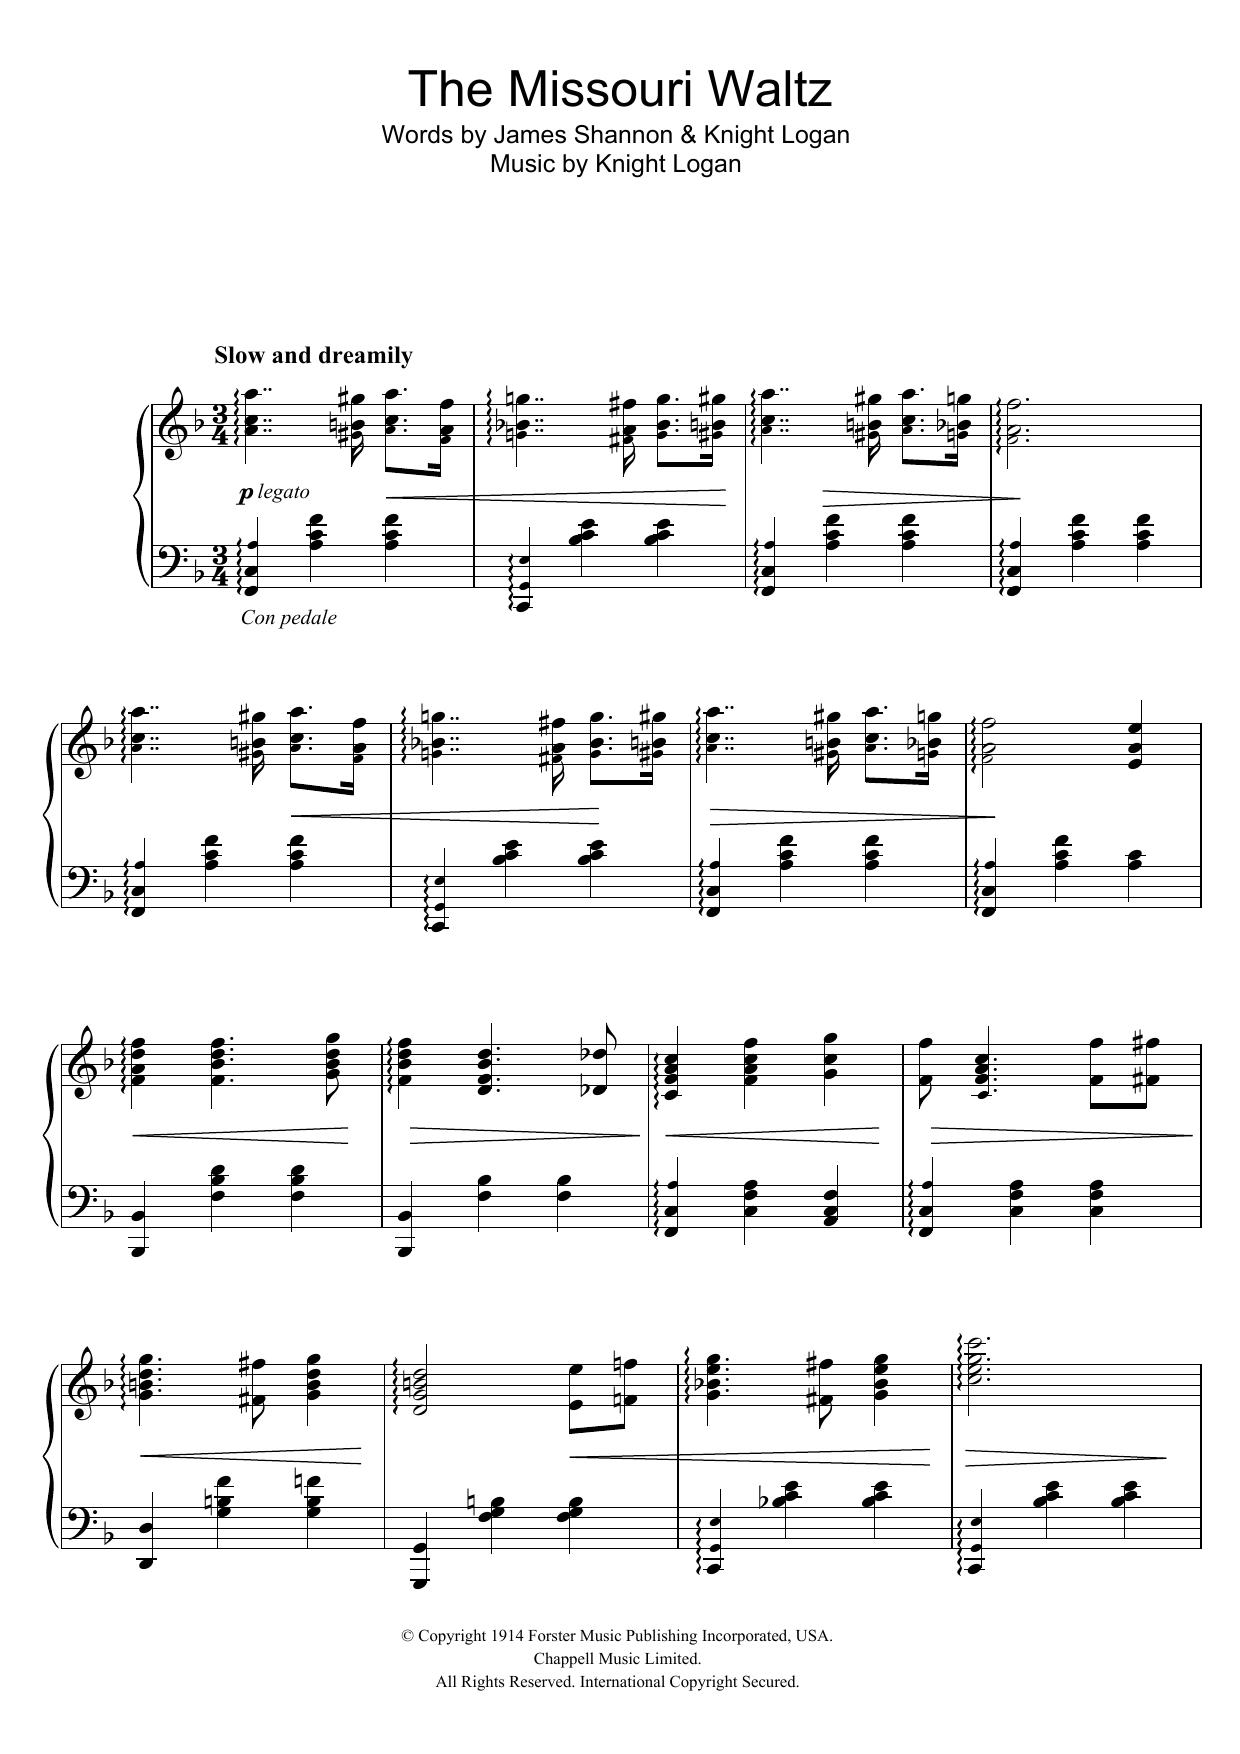 The Missouri Waltz Sheet Music